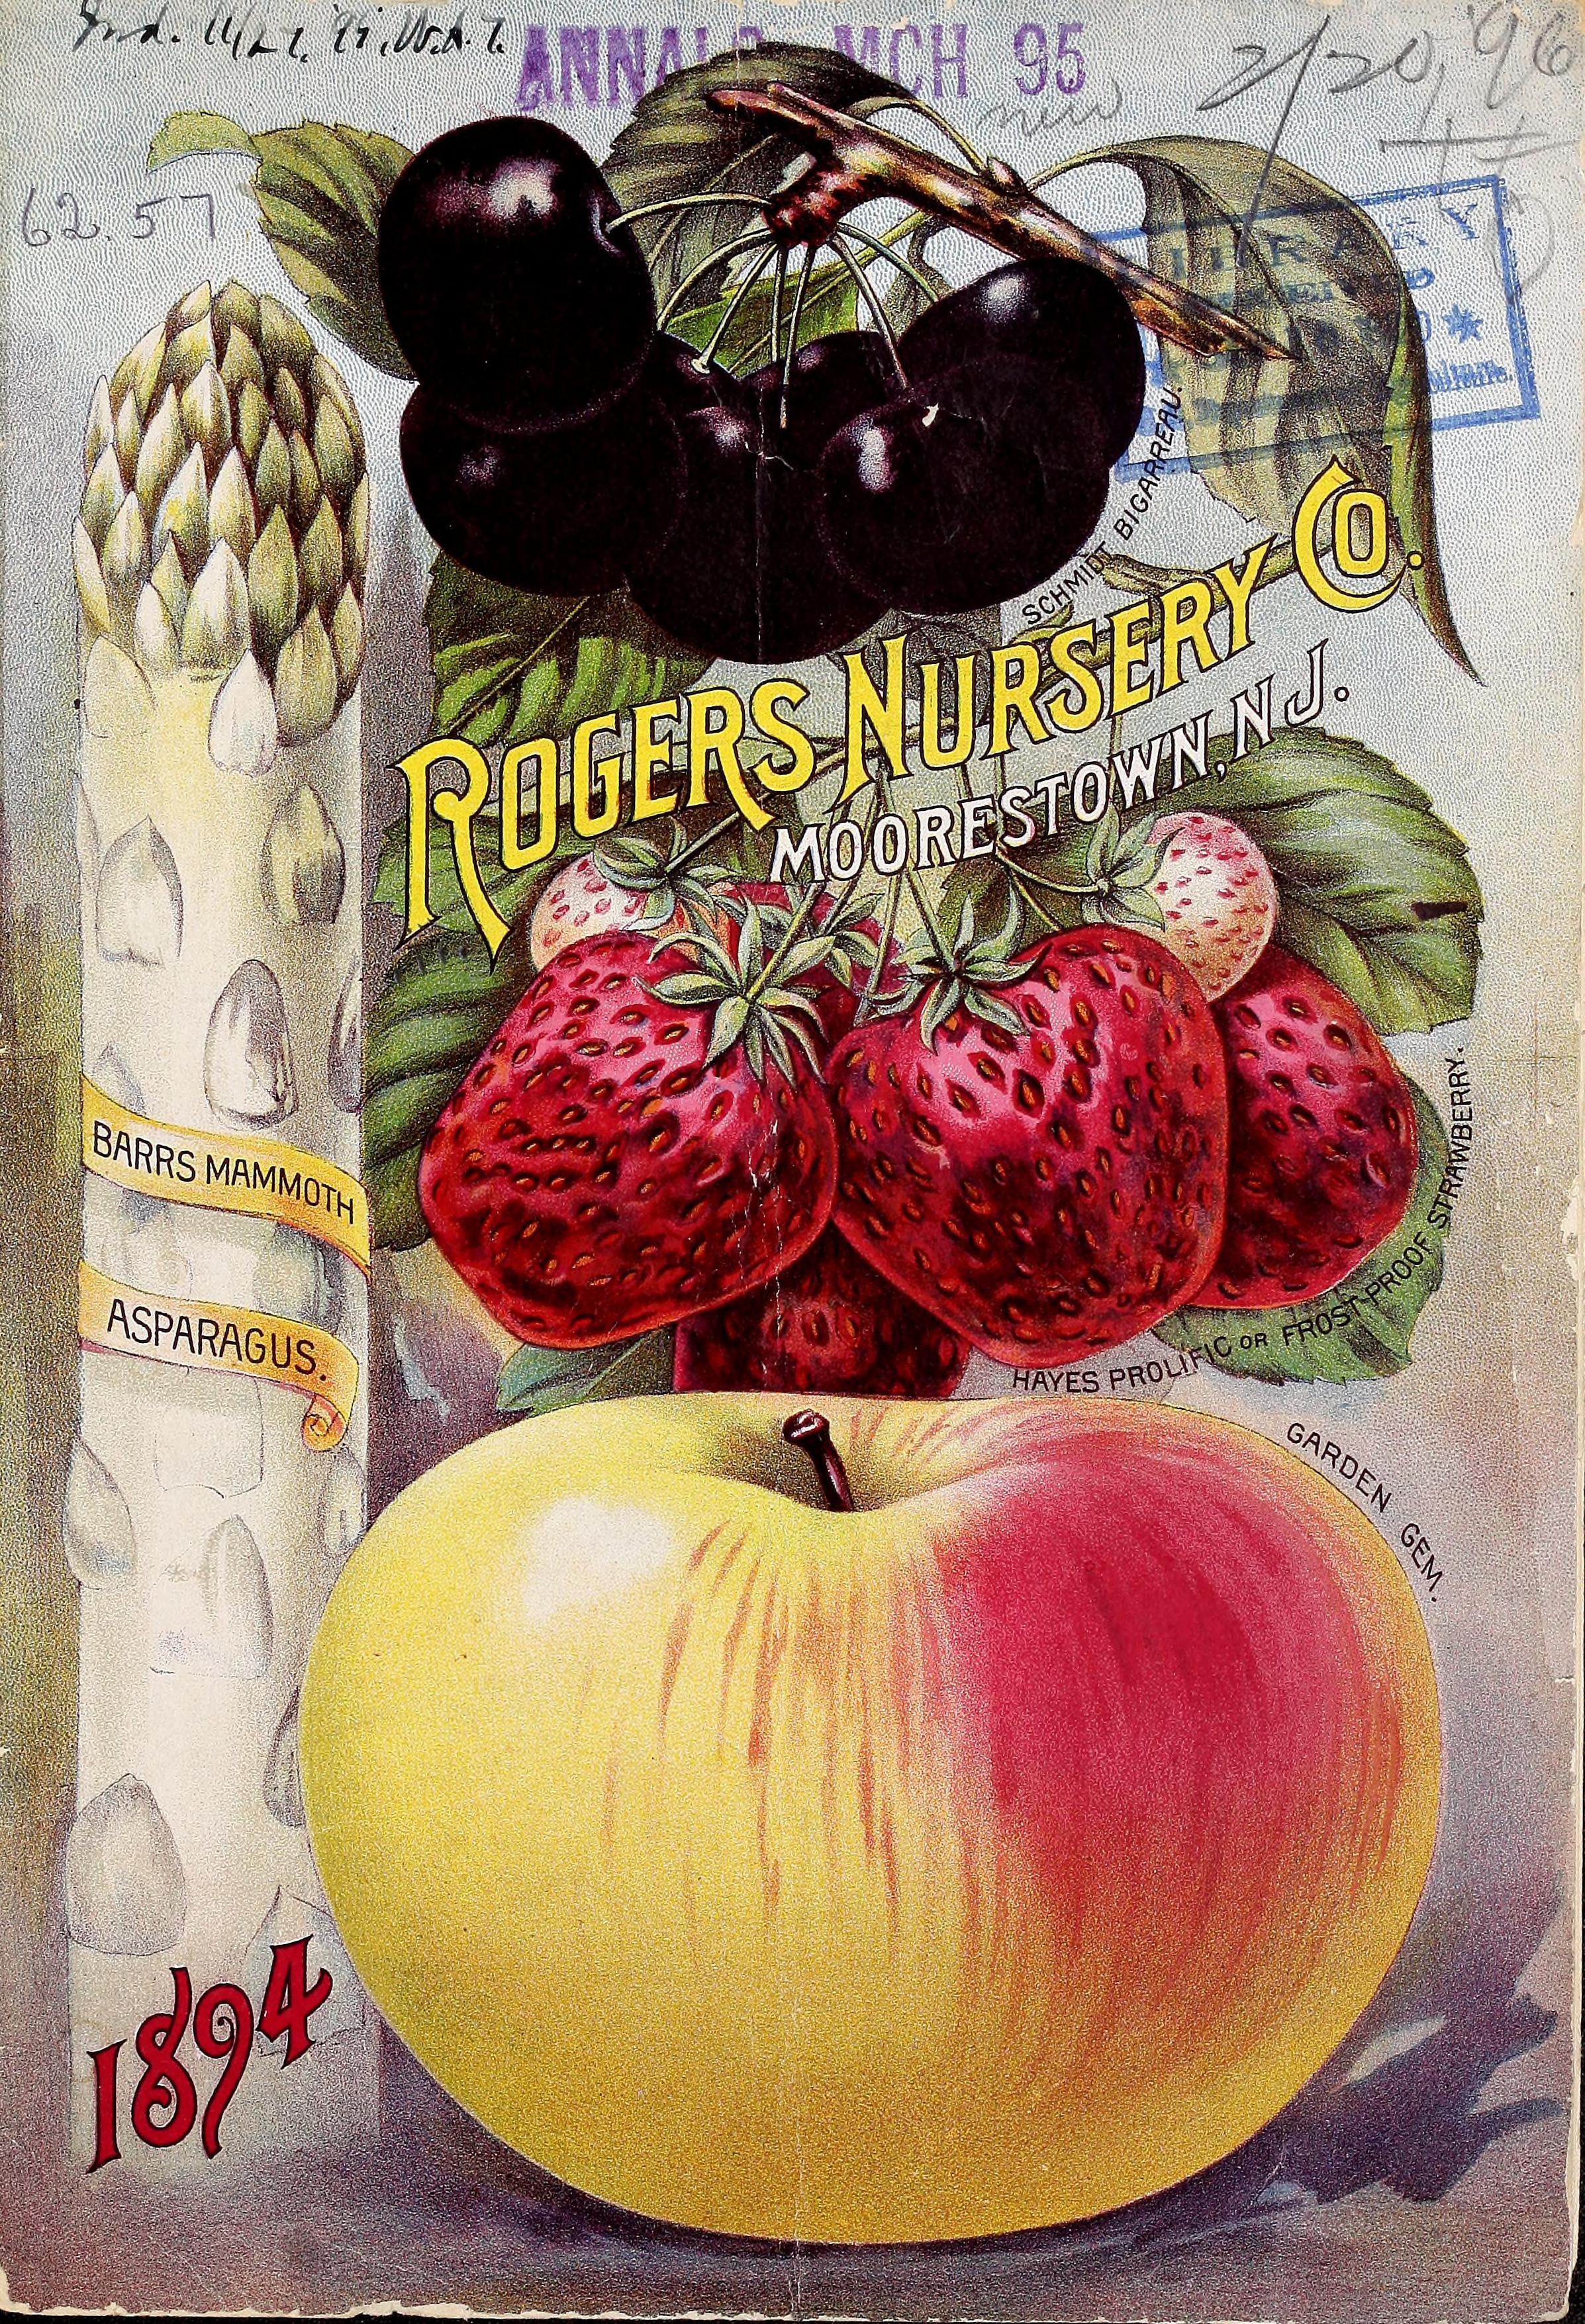 Rogers Nursery Co